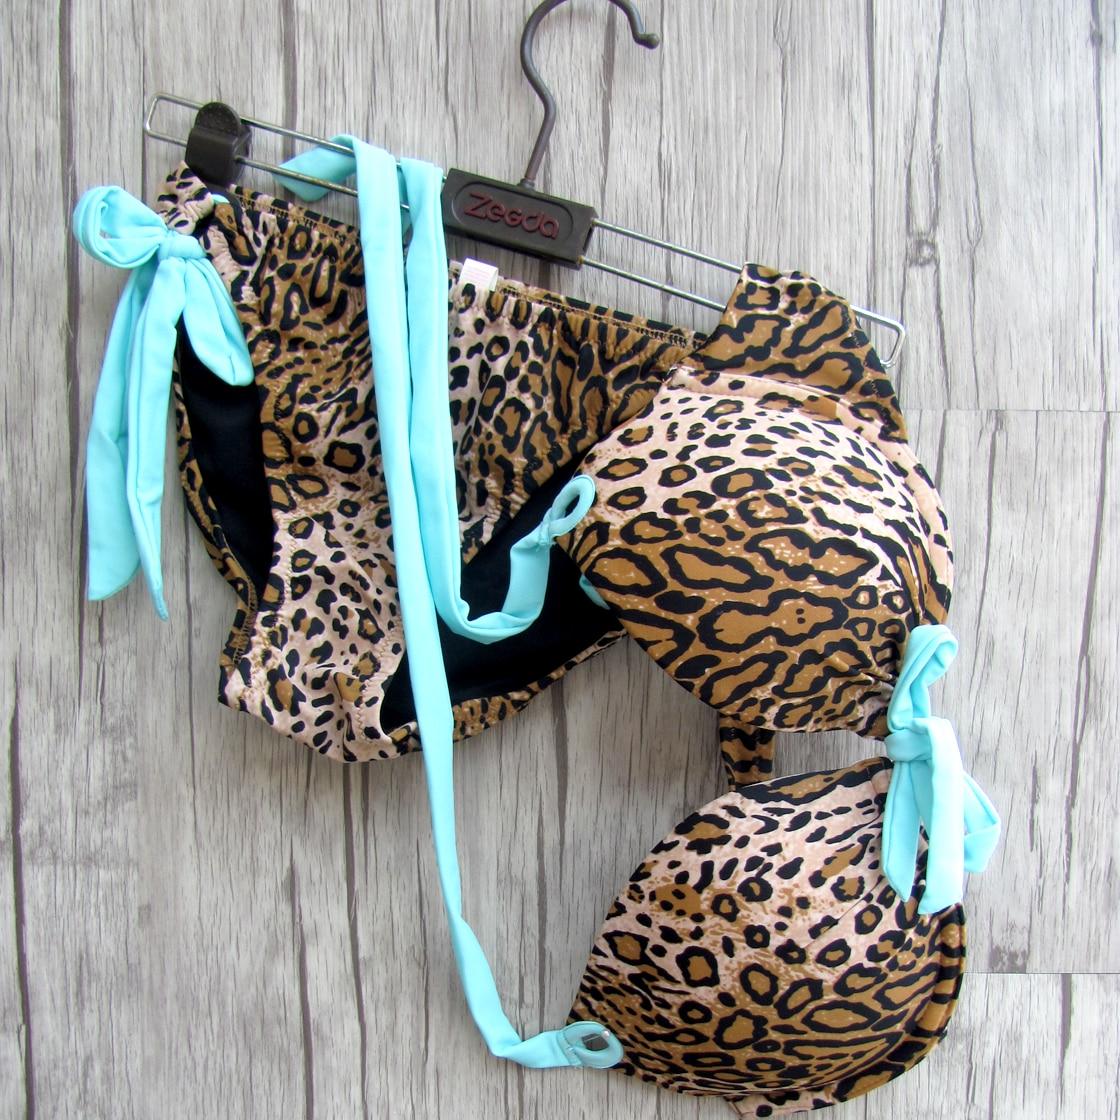 Women Bikini leopard Bathing suits UNDERWIRE Maillot de bain Low Waist Designs Secret Swimwear Sexy biqini<br><br>Aliexpress